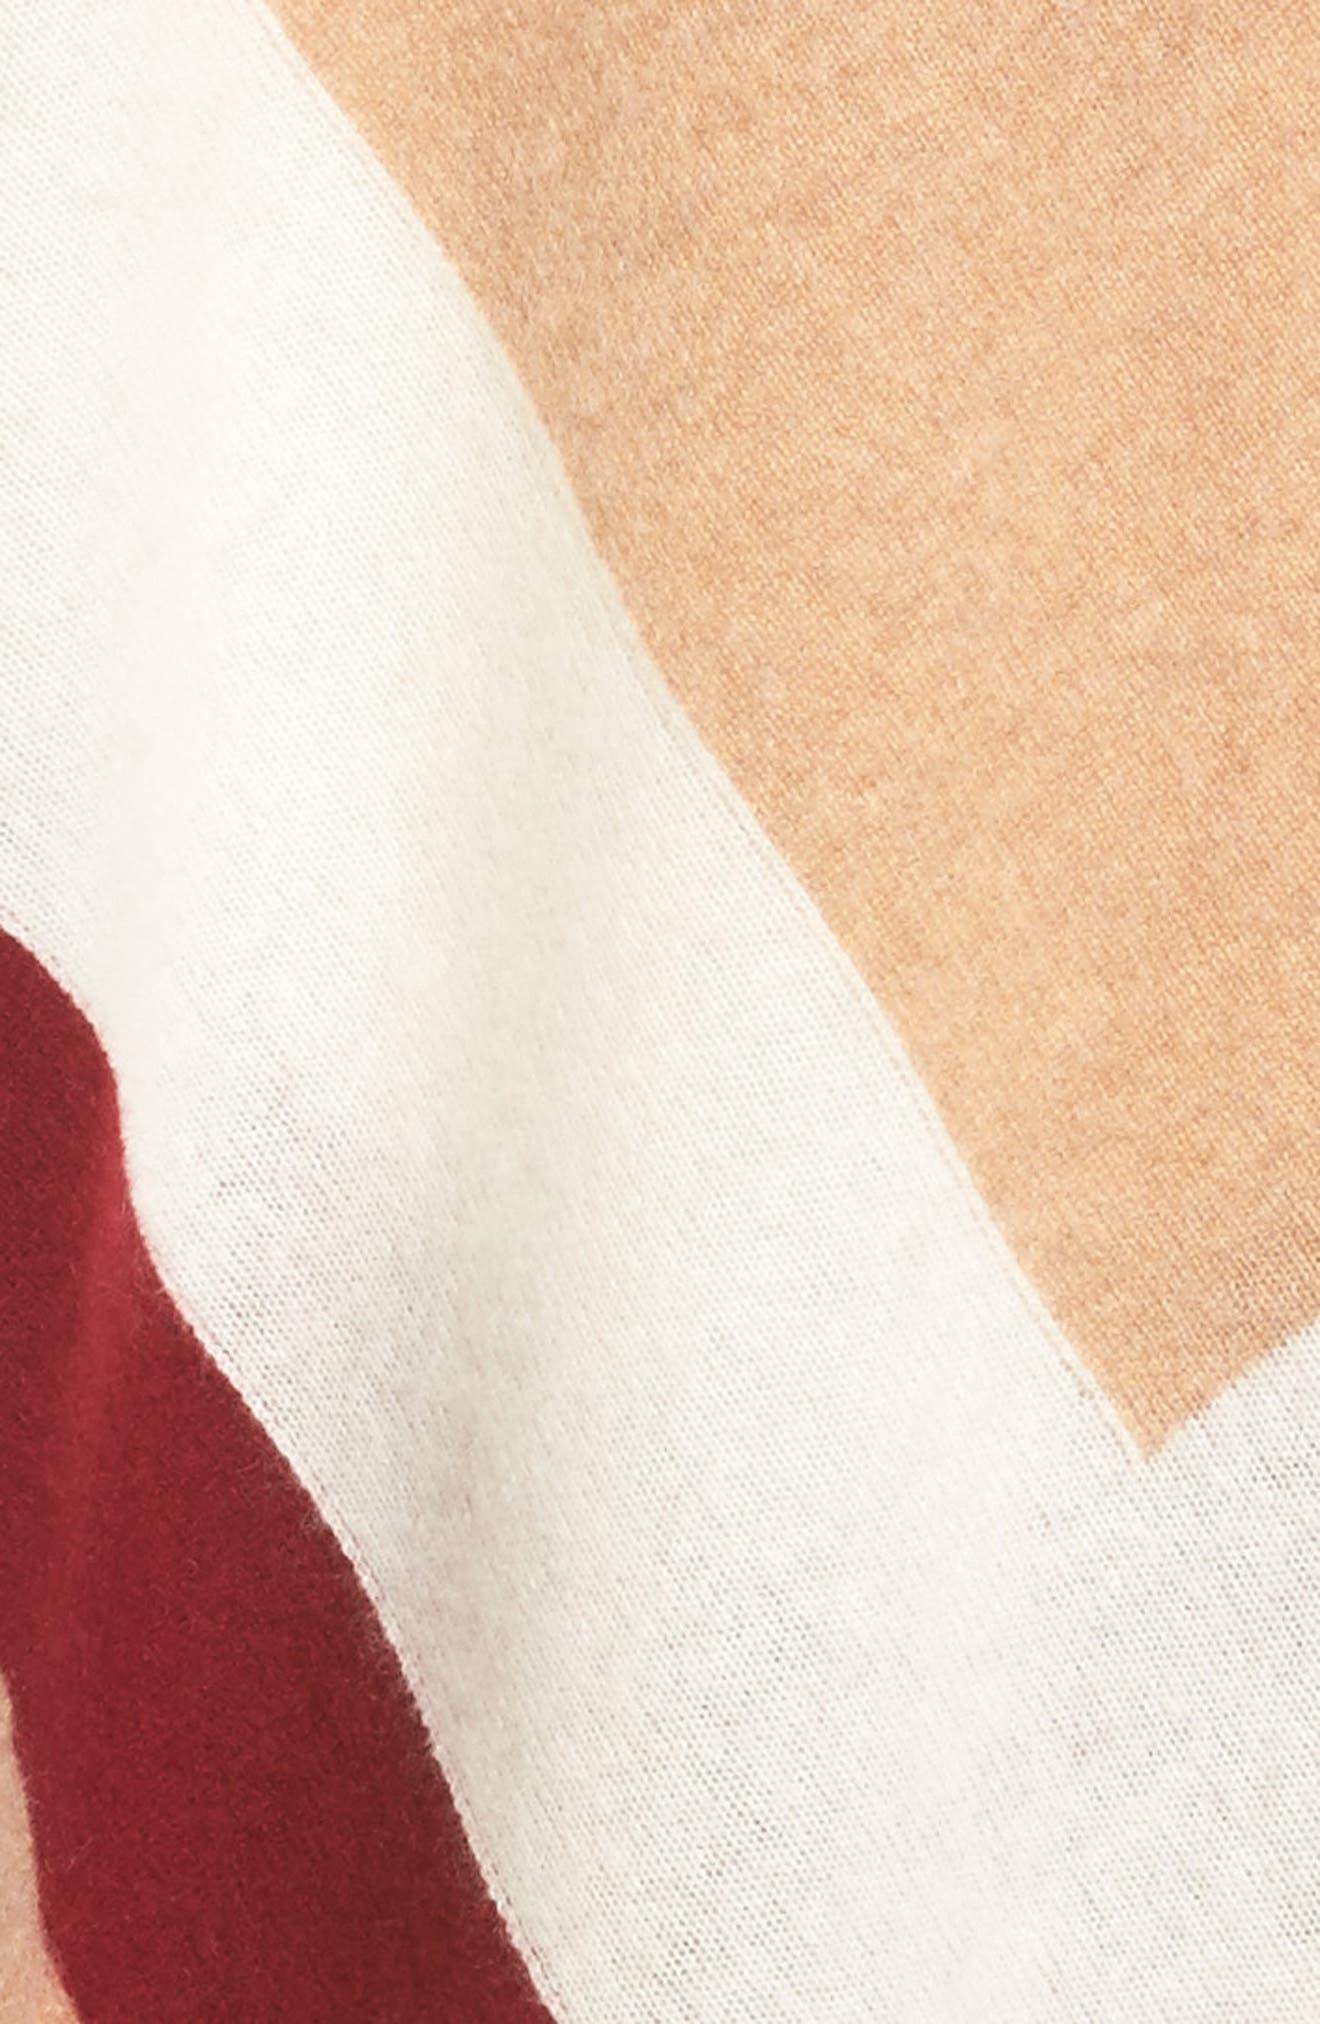 Tassel Trim Cashmere Wrap,                             Alternate thumbnail 5, color,                             Tan Camel Heather Combo